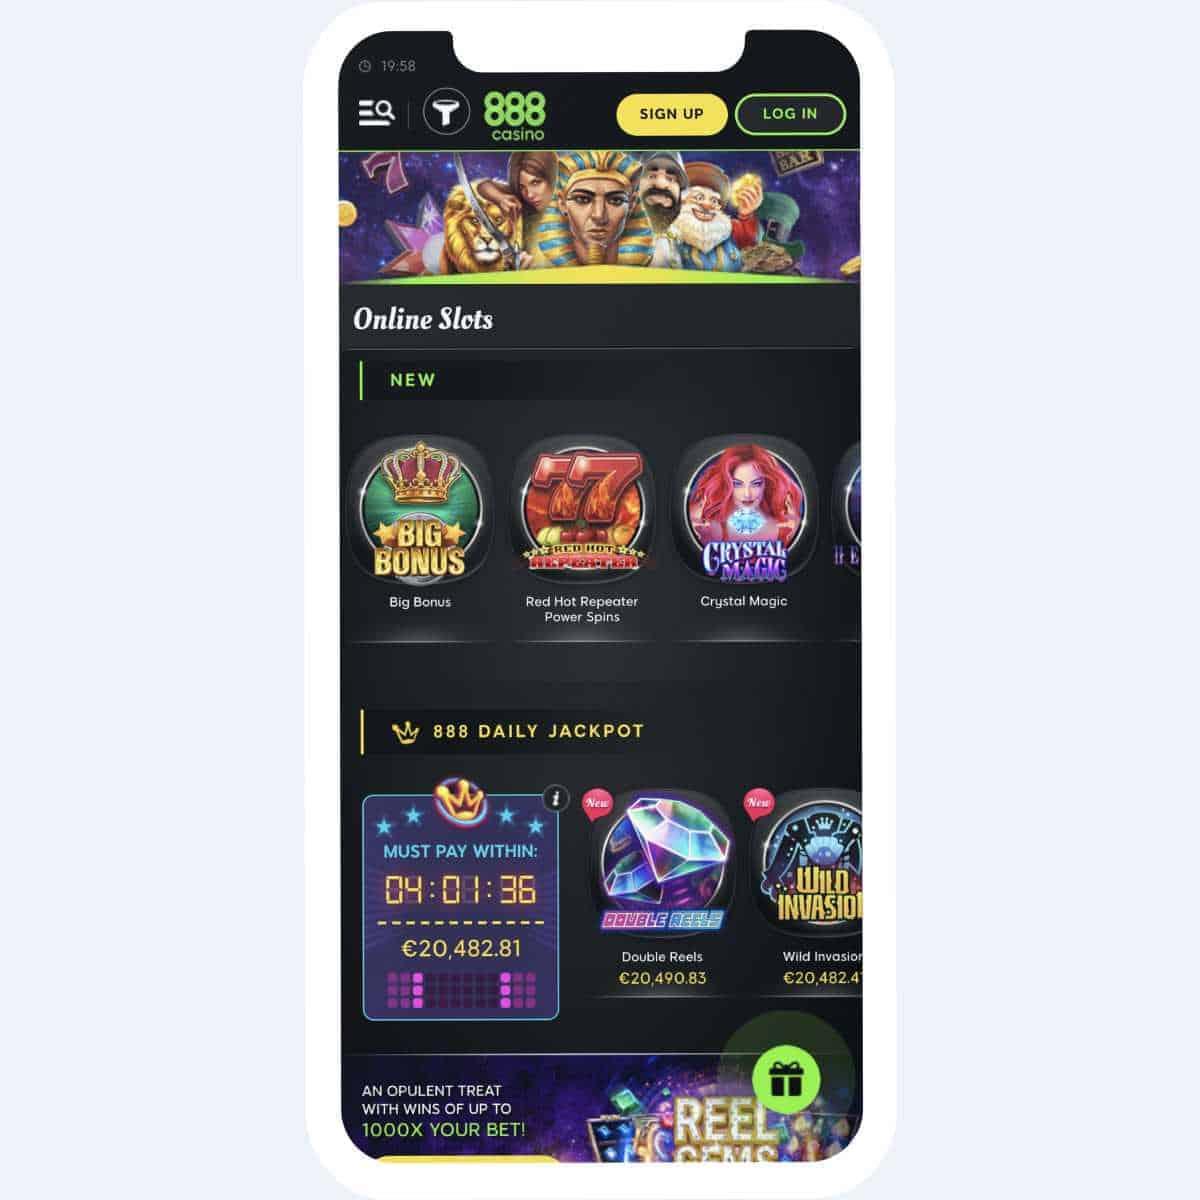 888 casino slots mobile